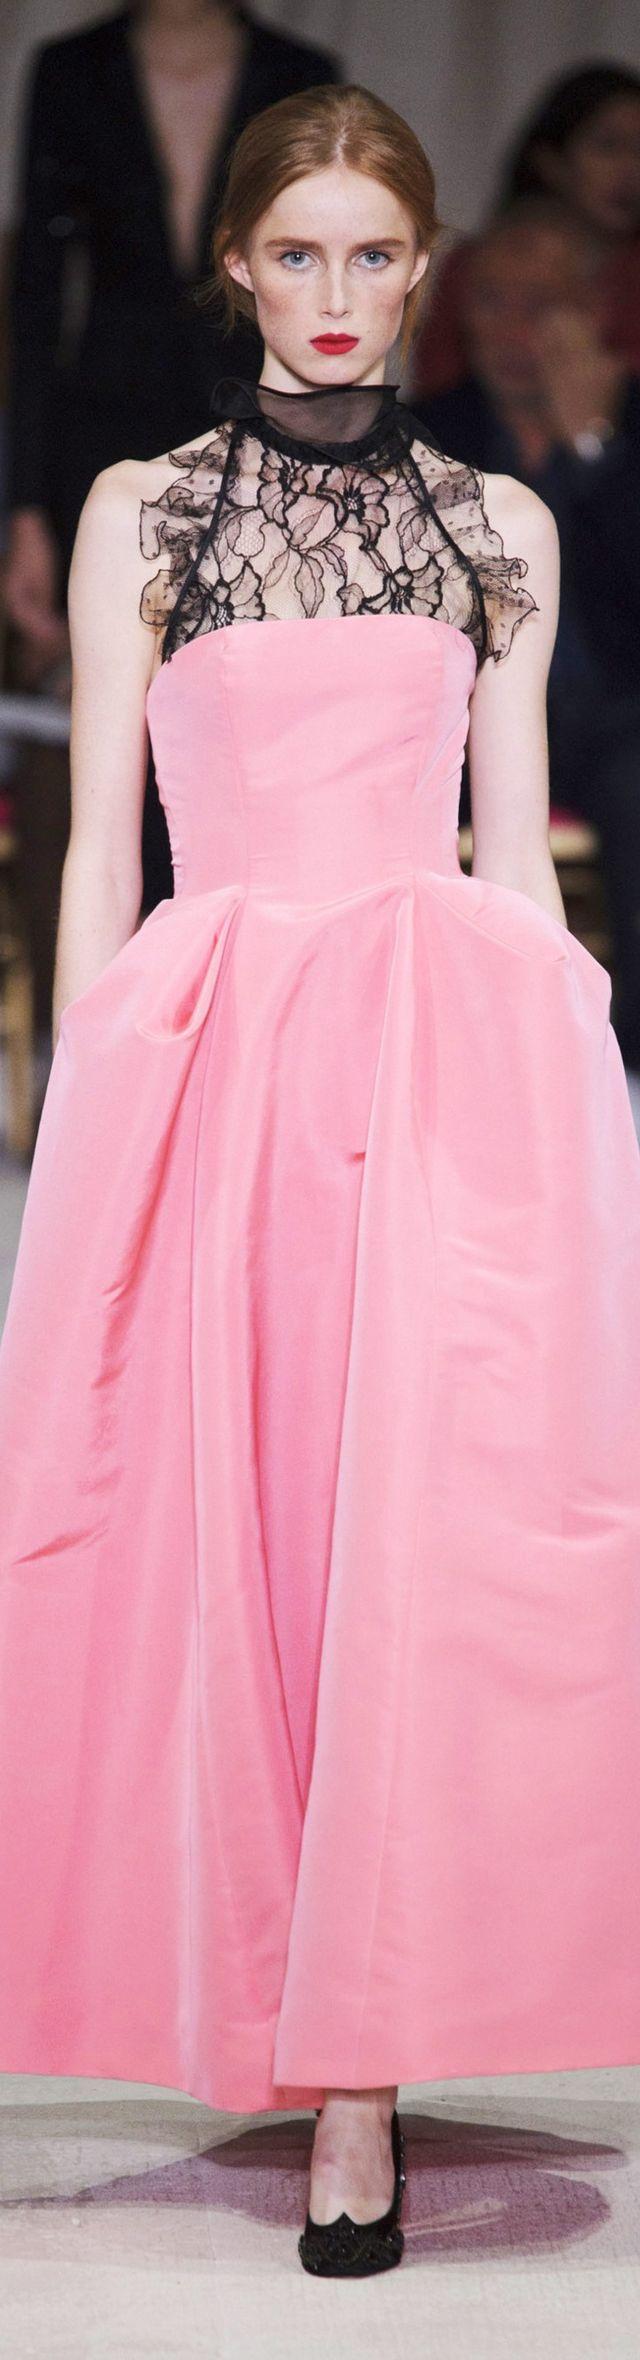 Oscar de la Renta Collection Spring 2016 Ready to Wear